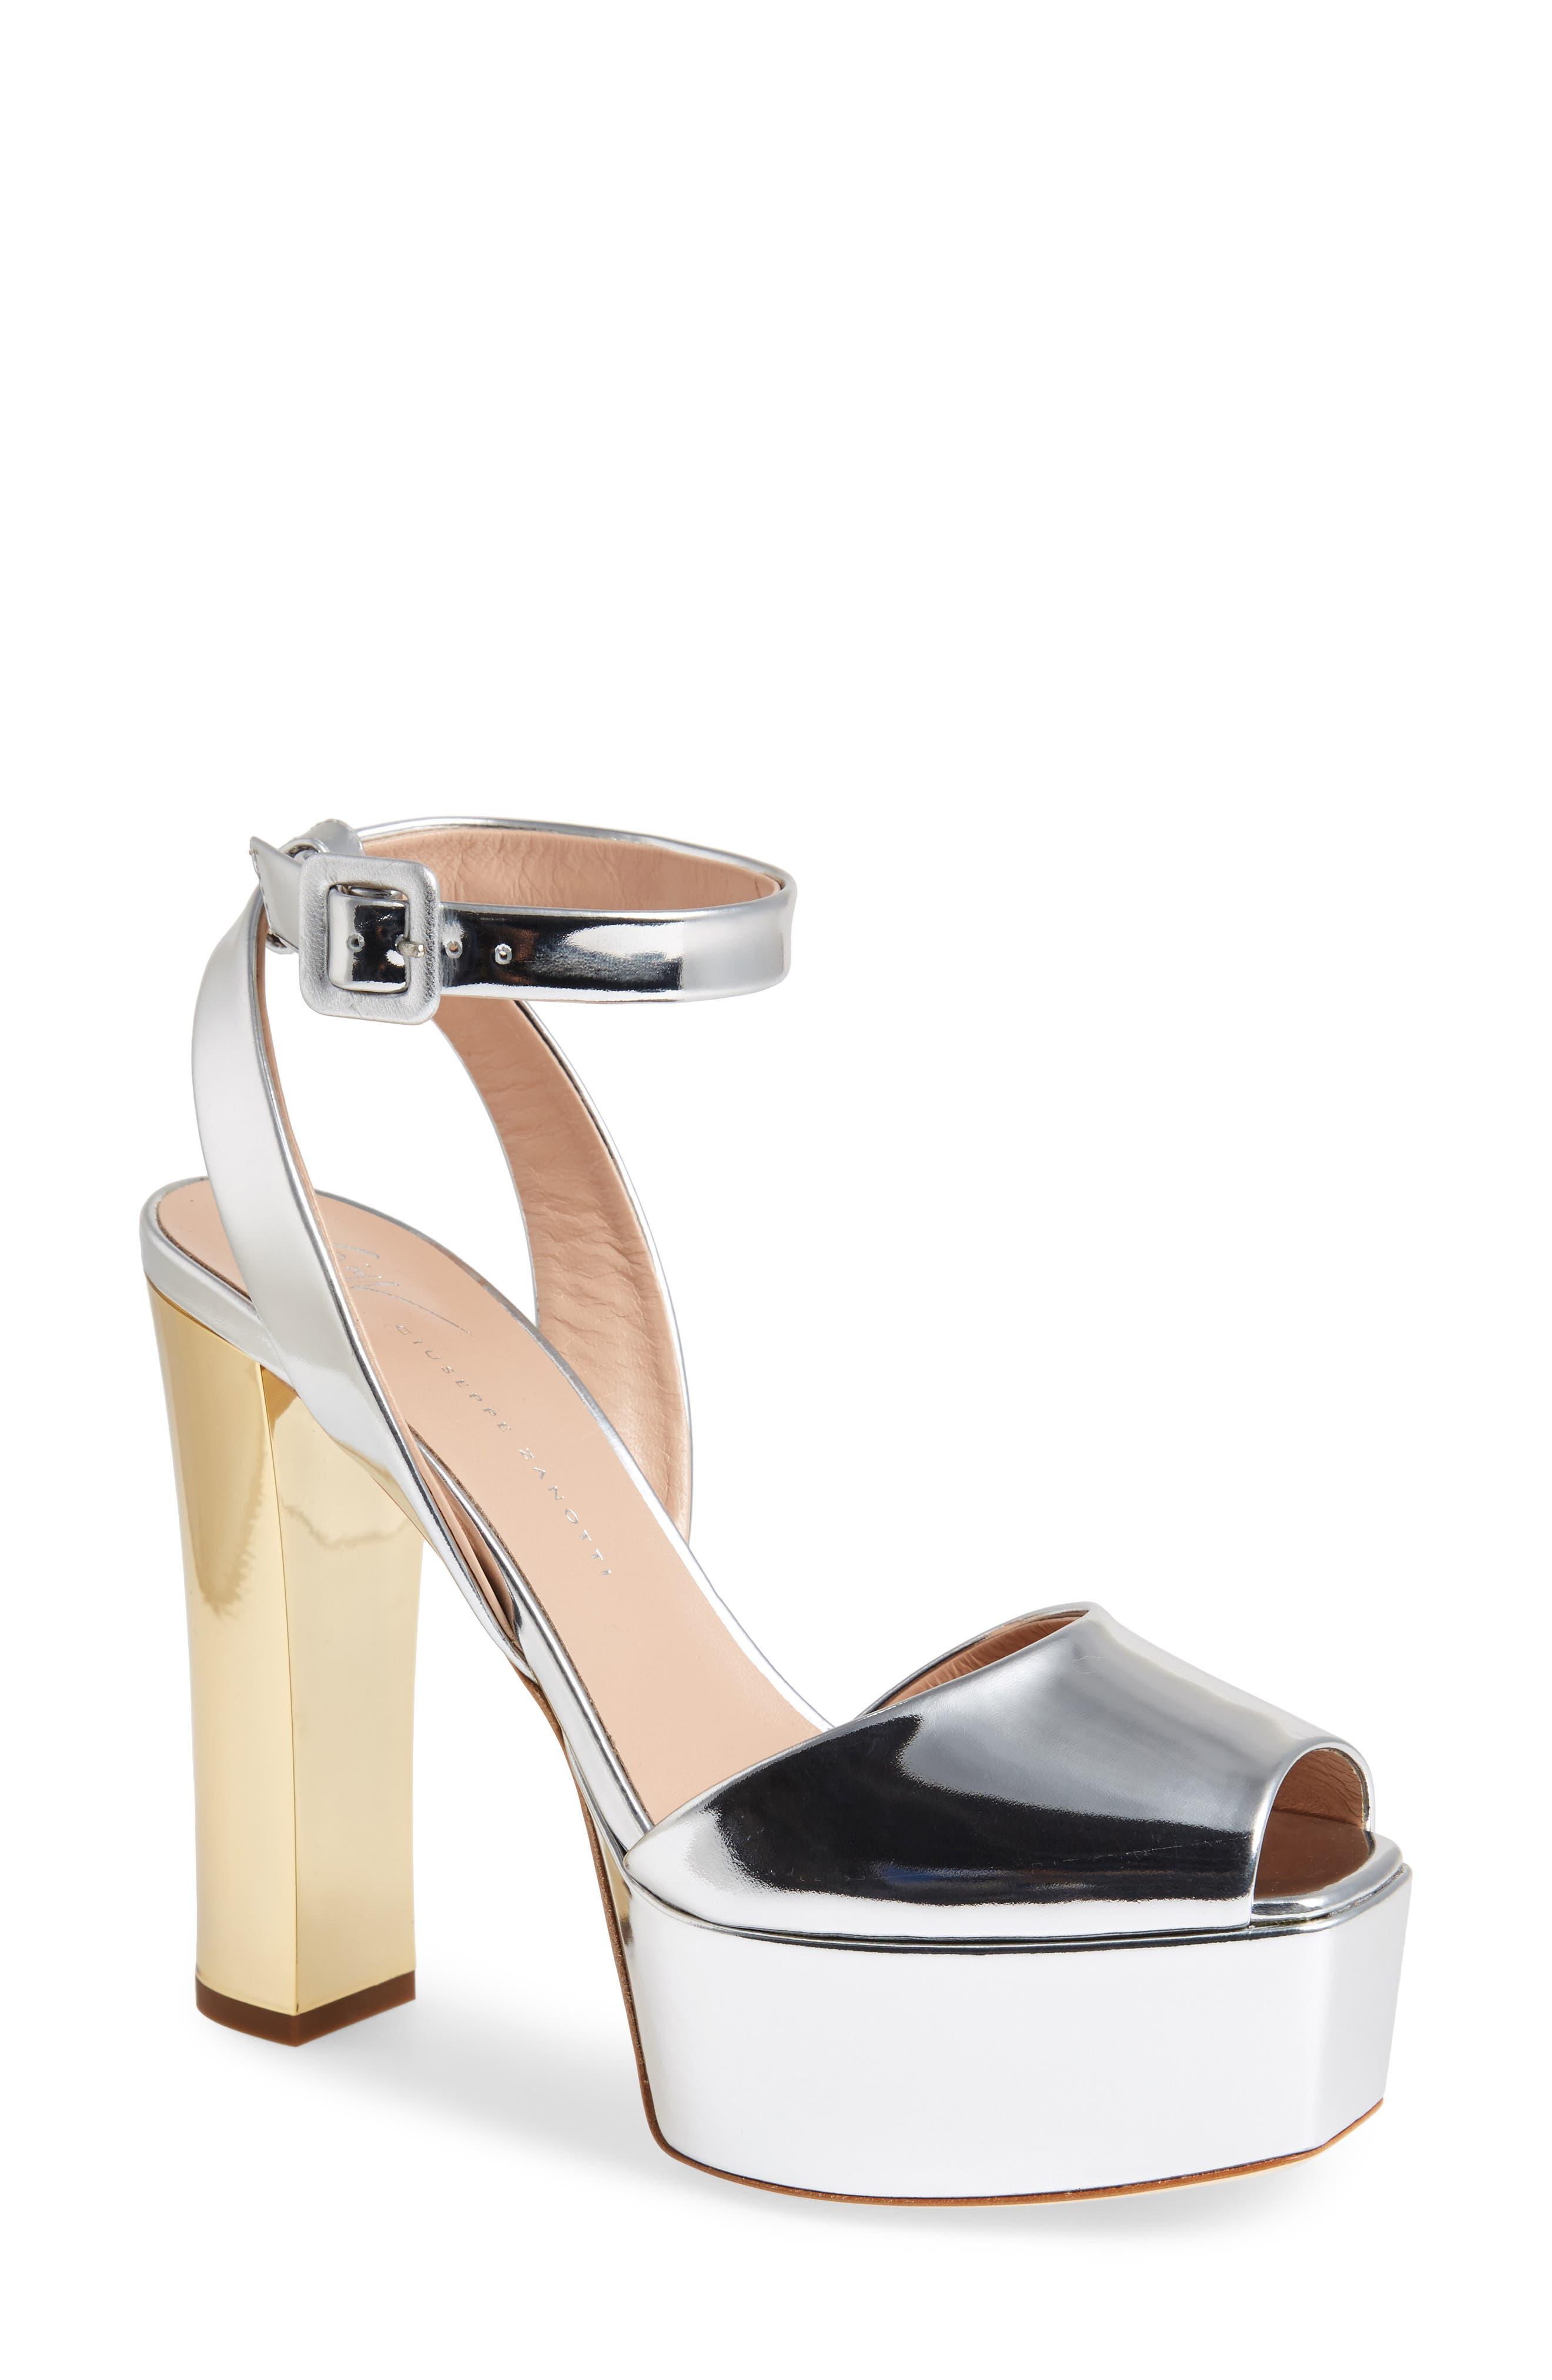 Main Image - Giuseppe Zanotti Lavinia Platform Sandal (Women)